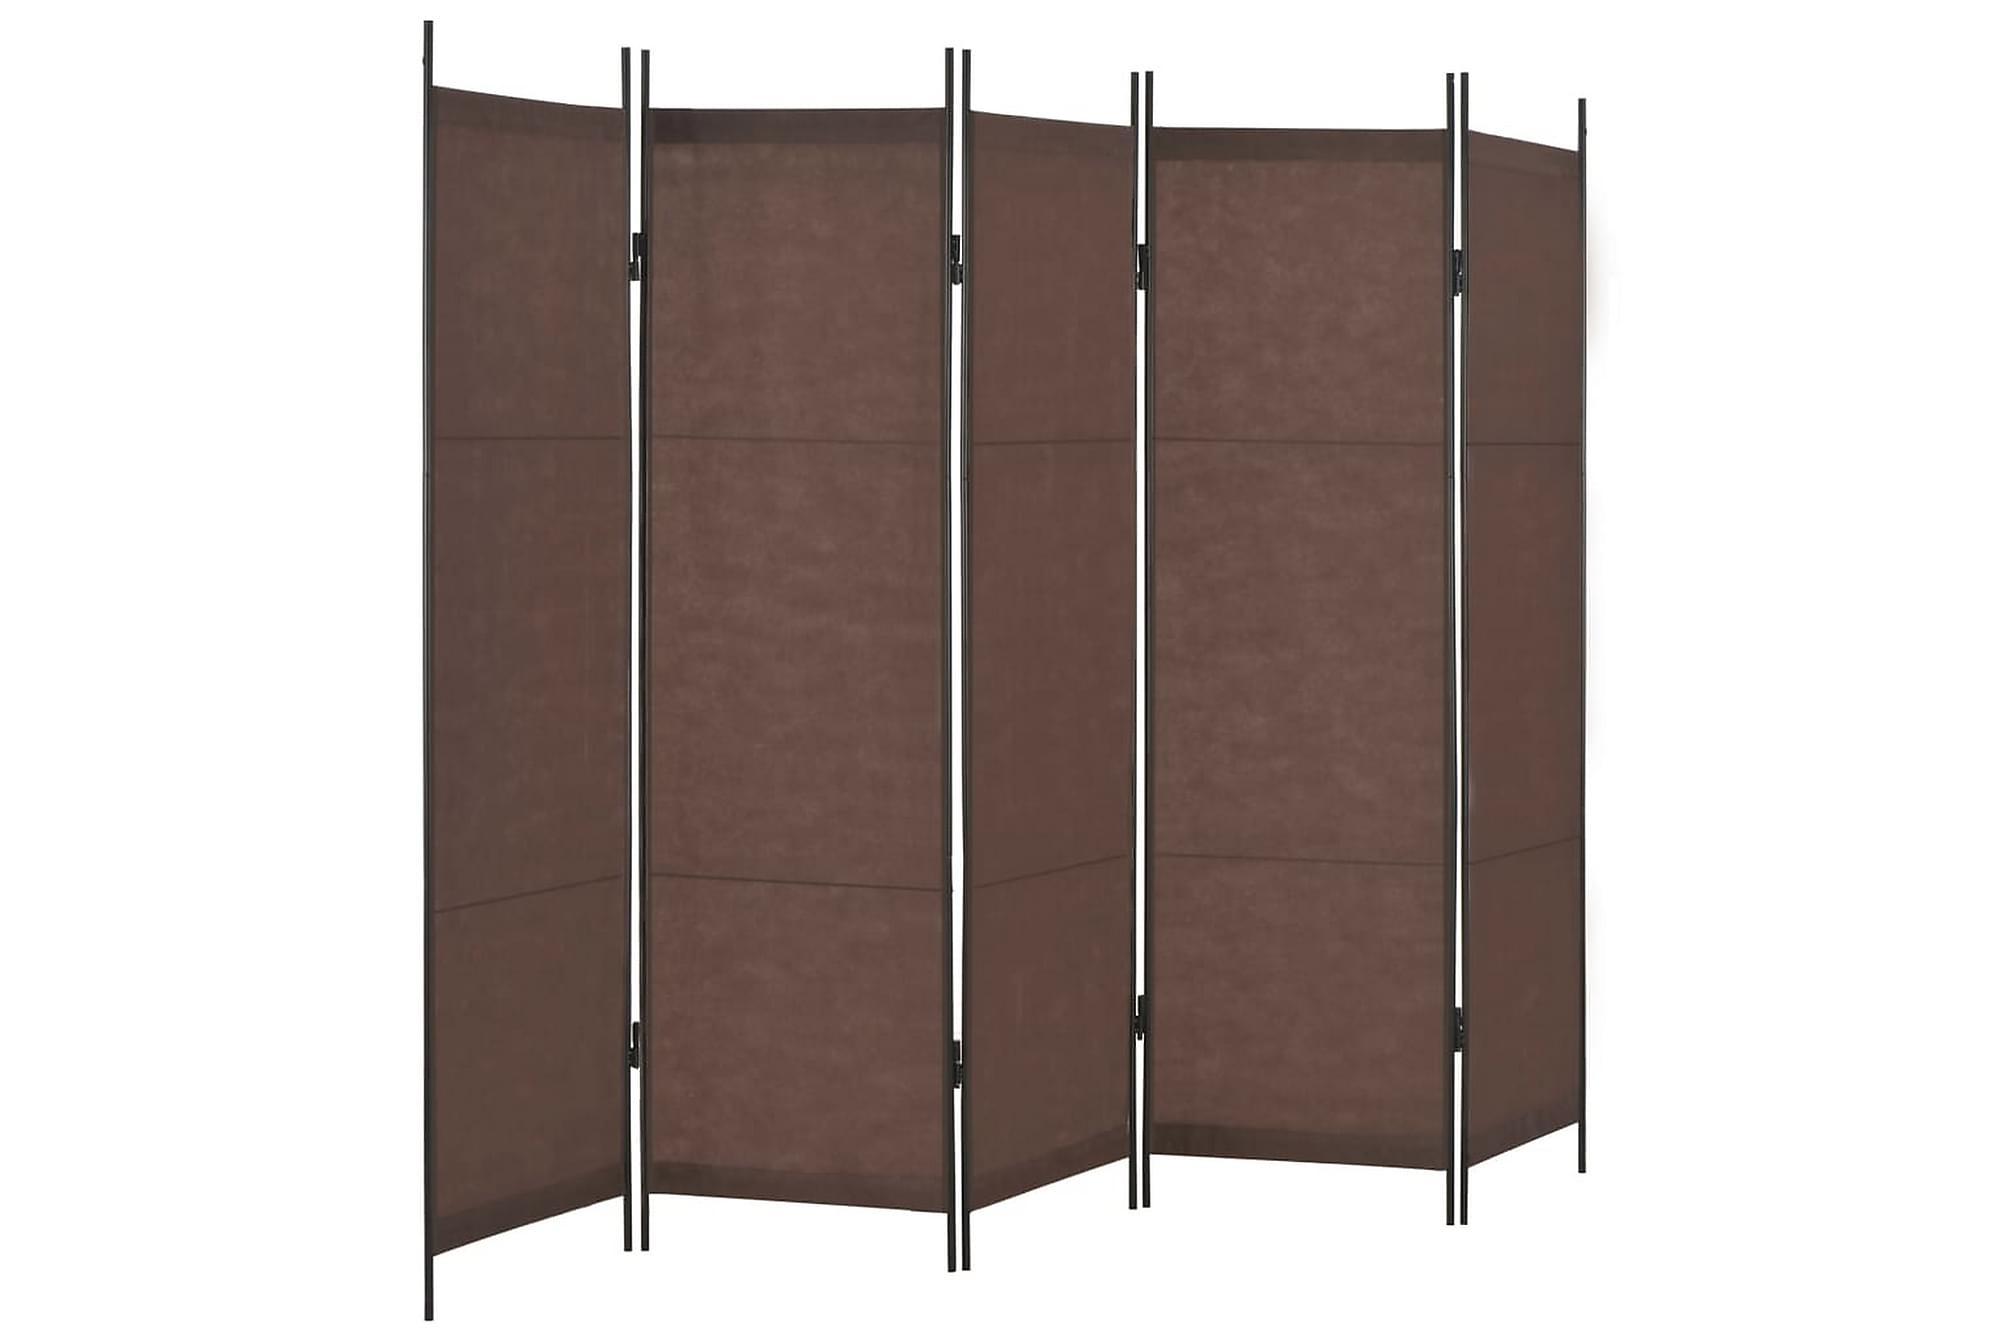 Rumsavdelare 5 paneler brun 250×180 cm